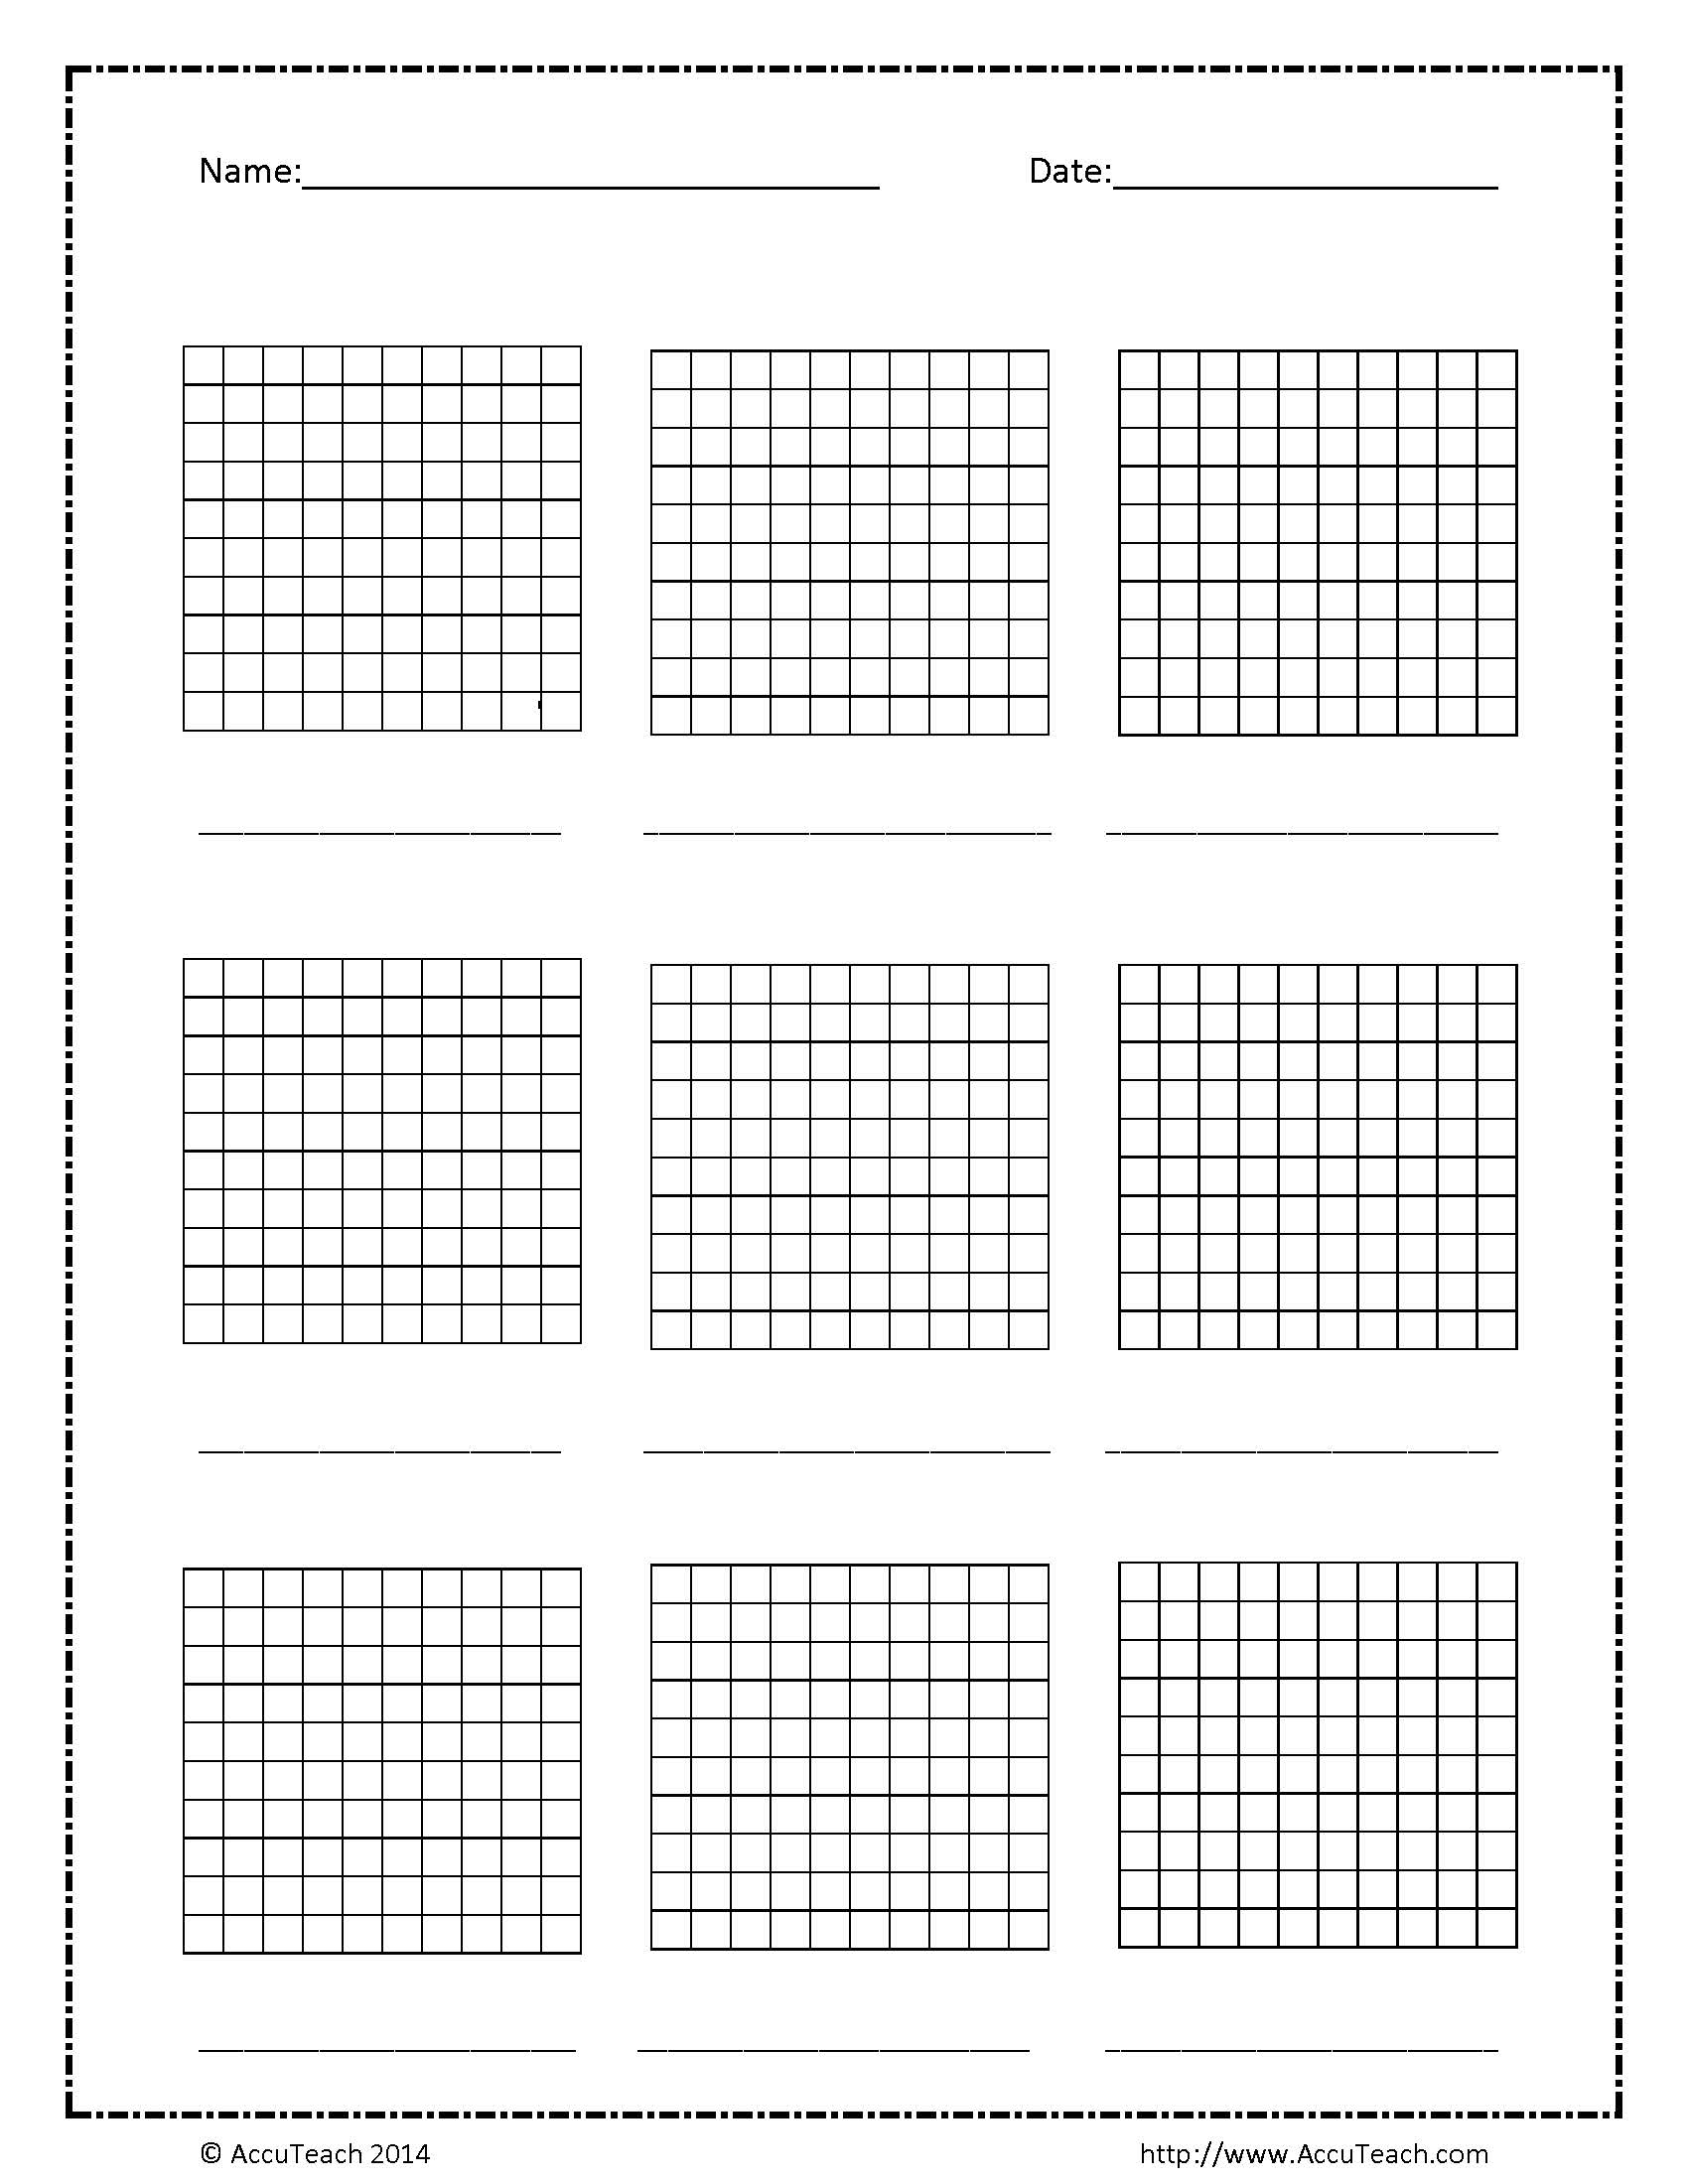 Blank Base Ten Hundreds Frame PDF - AccuTeach [ 2200 x 1700 Pixel ]